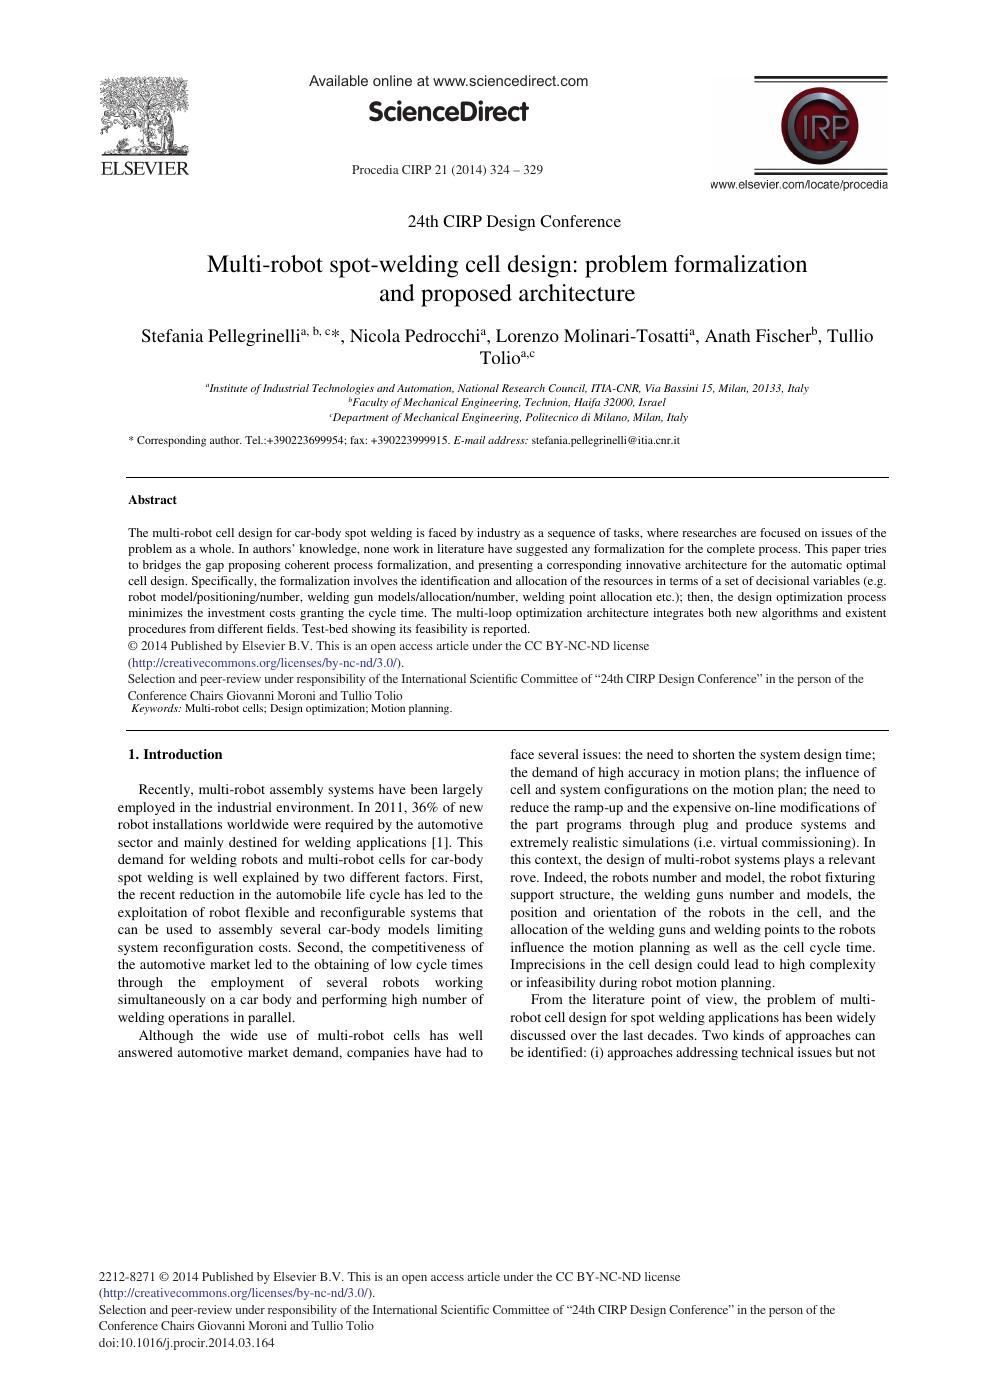 Multi-robot Spot-welding Cell Design: Problem Formalization